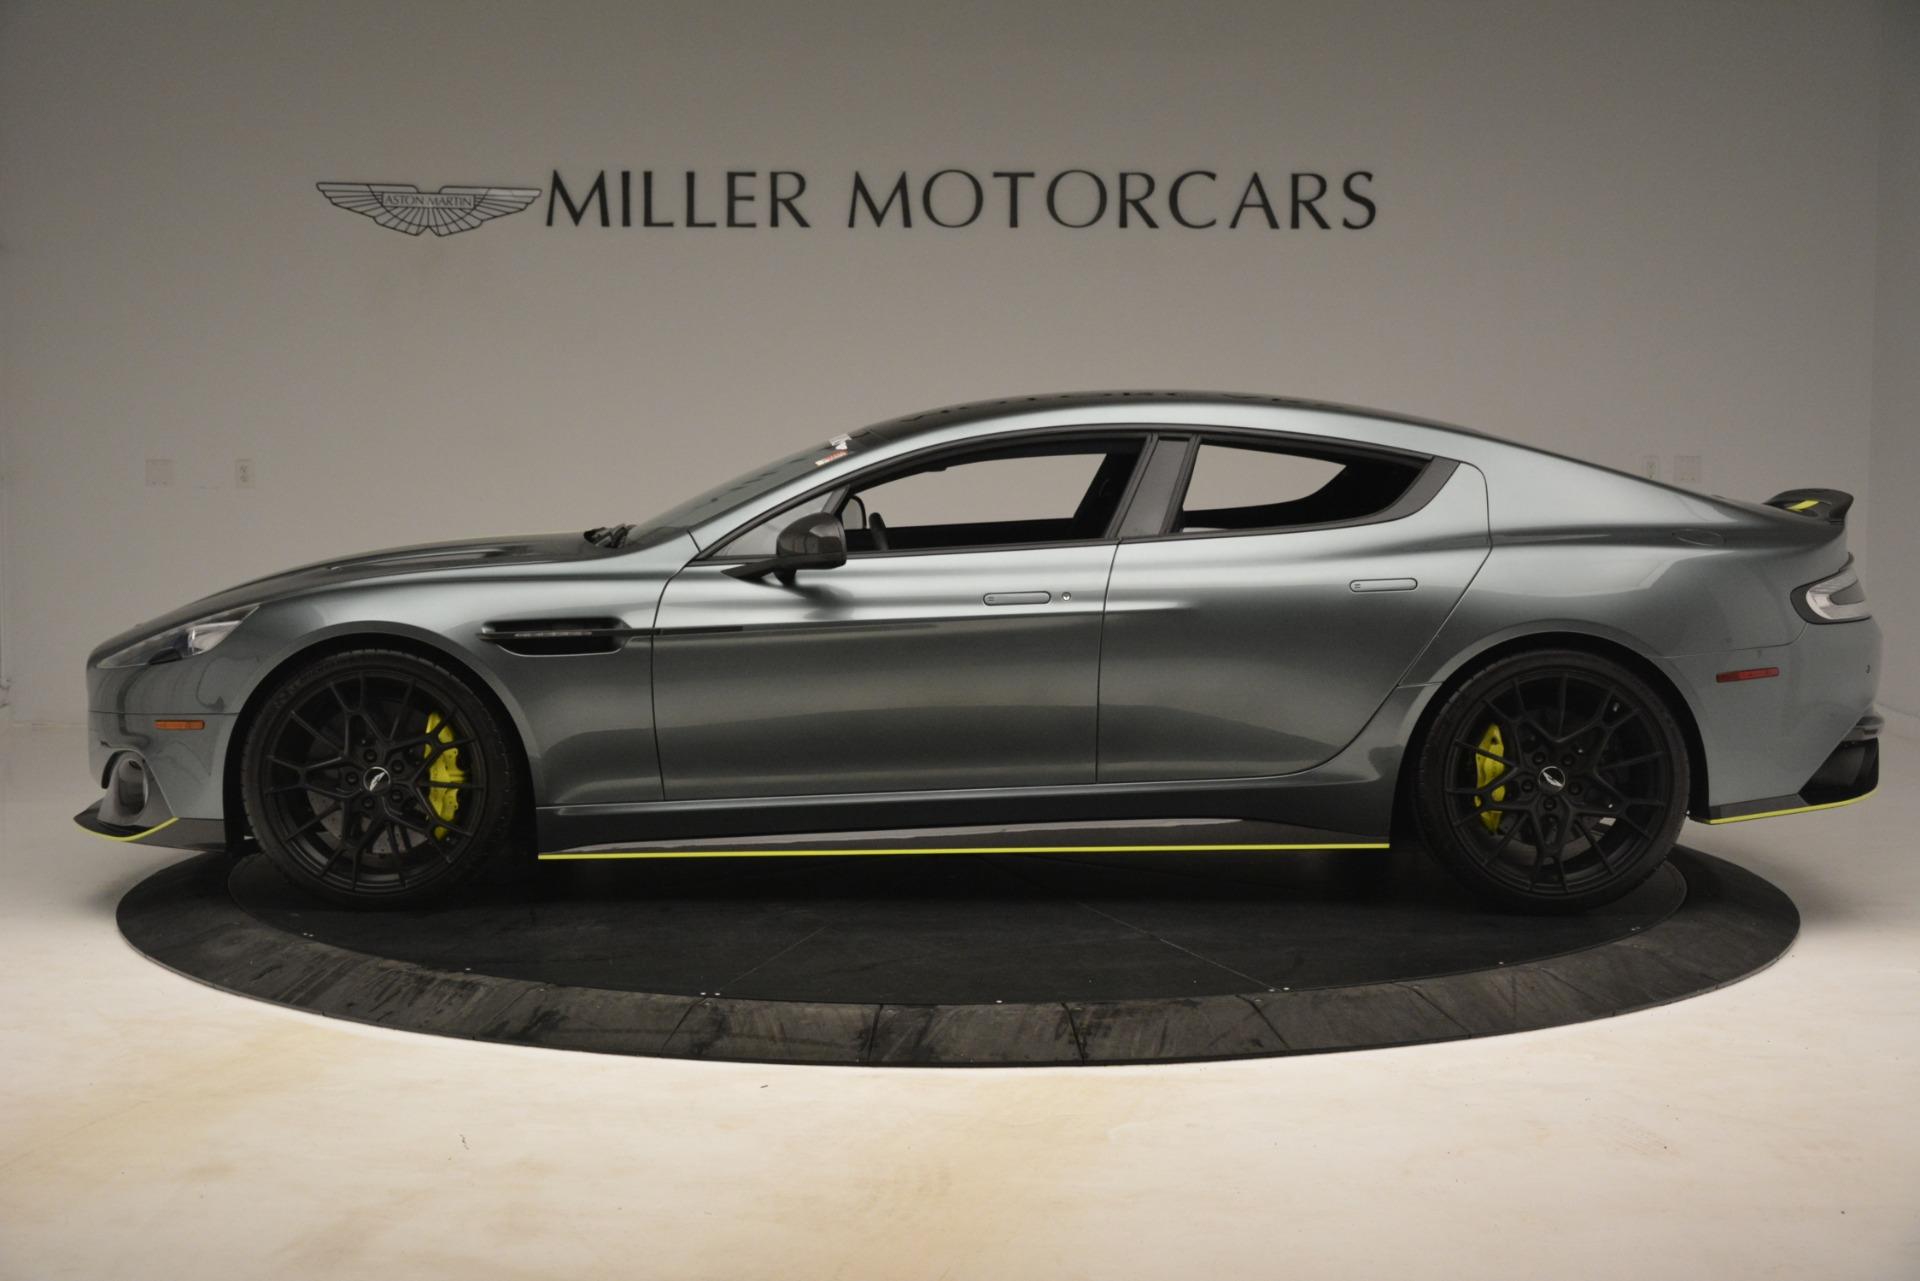 New 2019 Aston Martin Rapide Amr Sedan For Sale 282 980 Aston Martin Of Greenwich Stock A1354